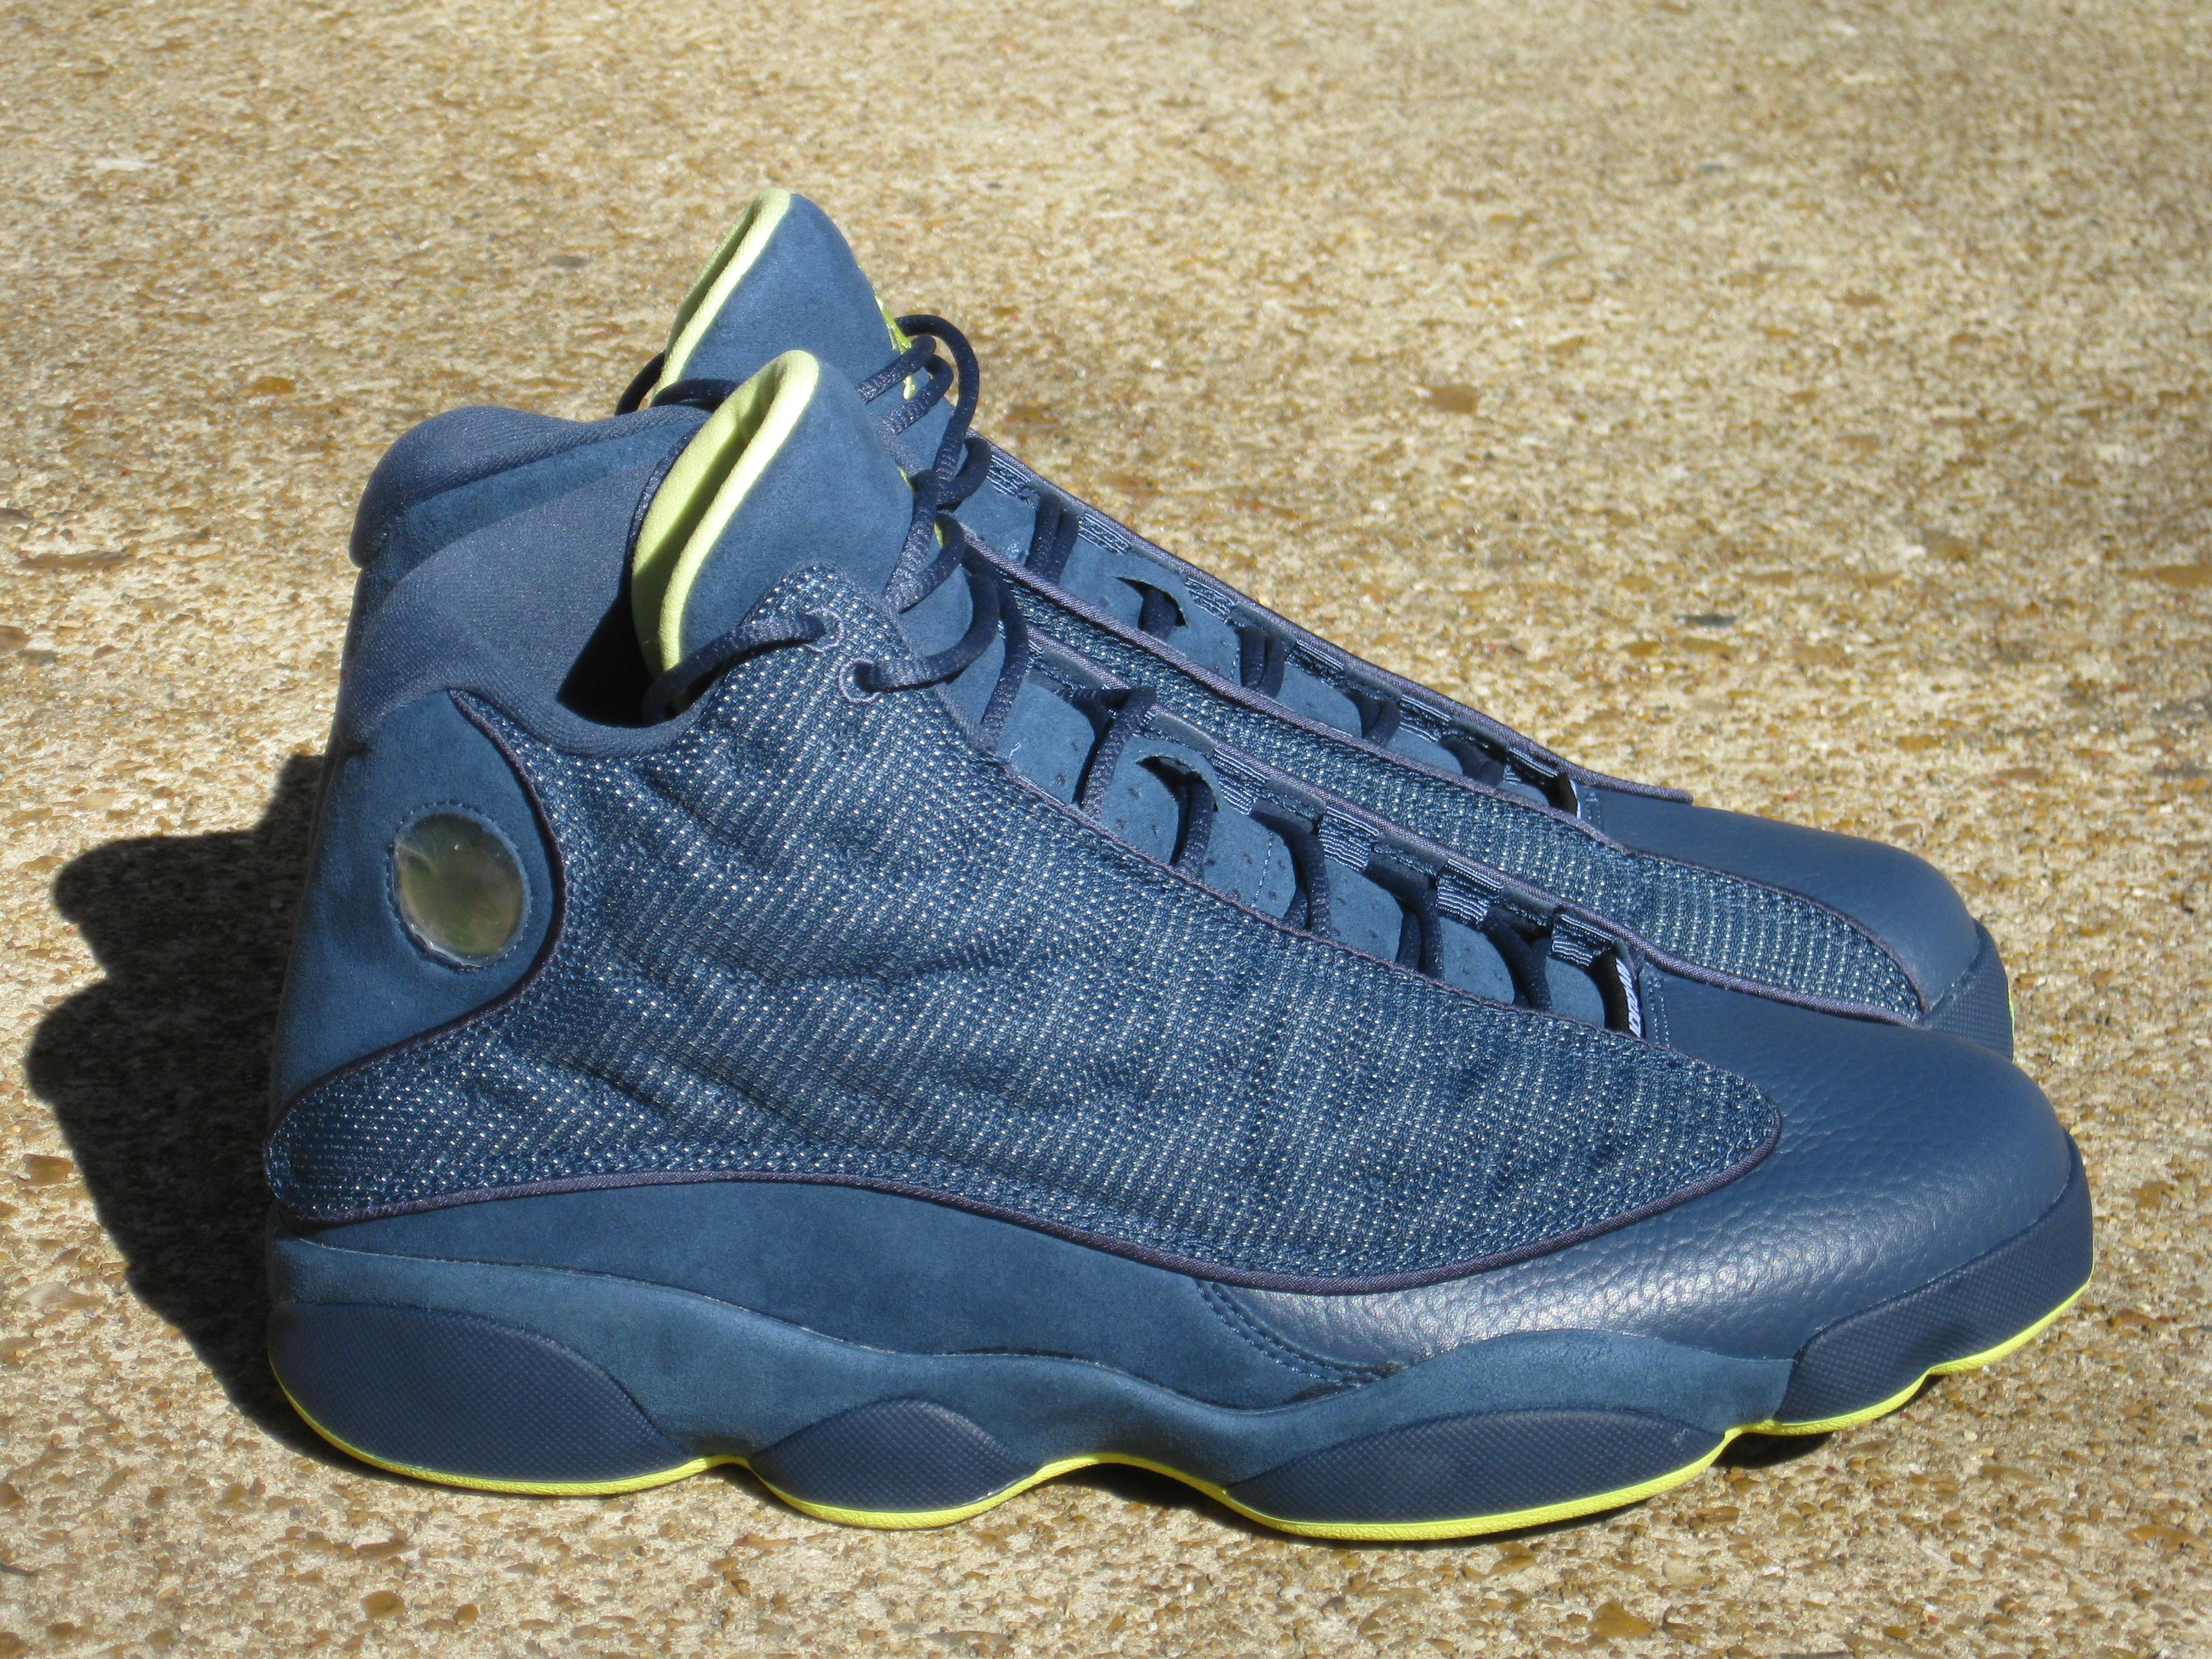 Air Jordan 13 Blue And Yellow